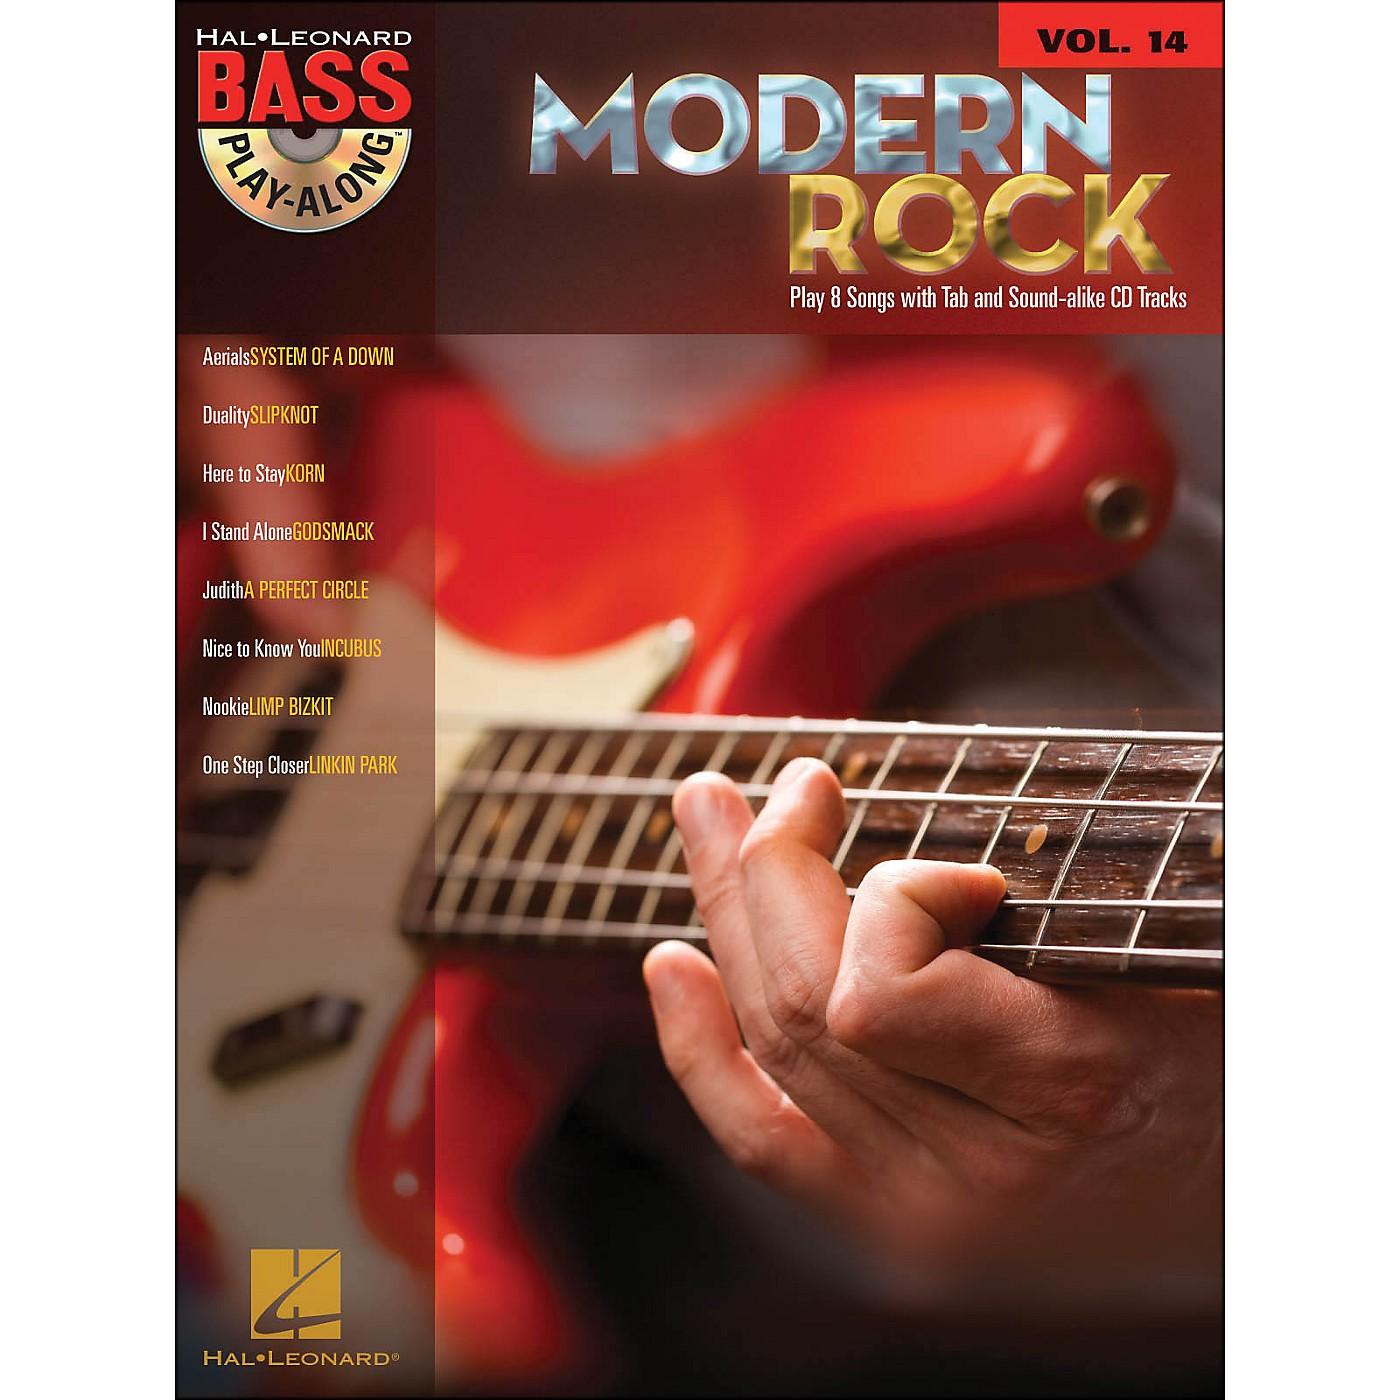 Hal Leonard Modern Rock Bass Play-Along Volume 14 Book/CD thumbnail